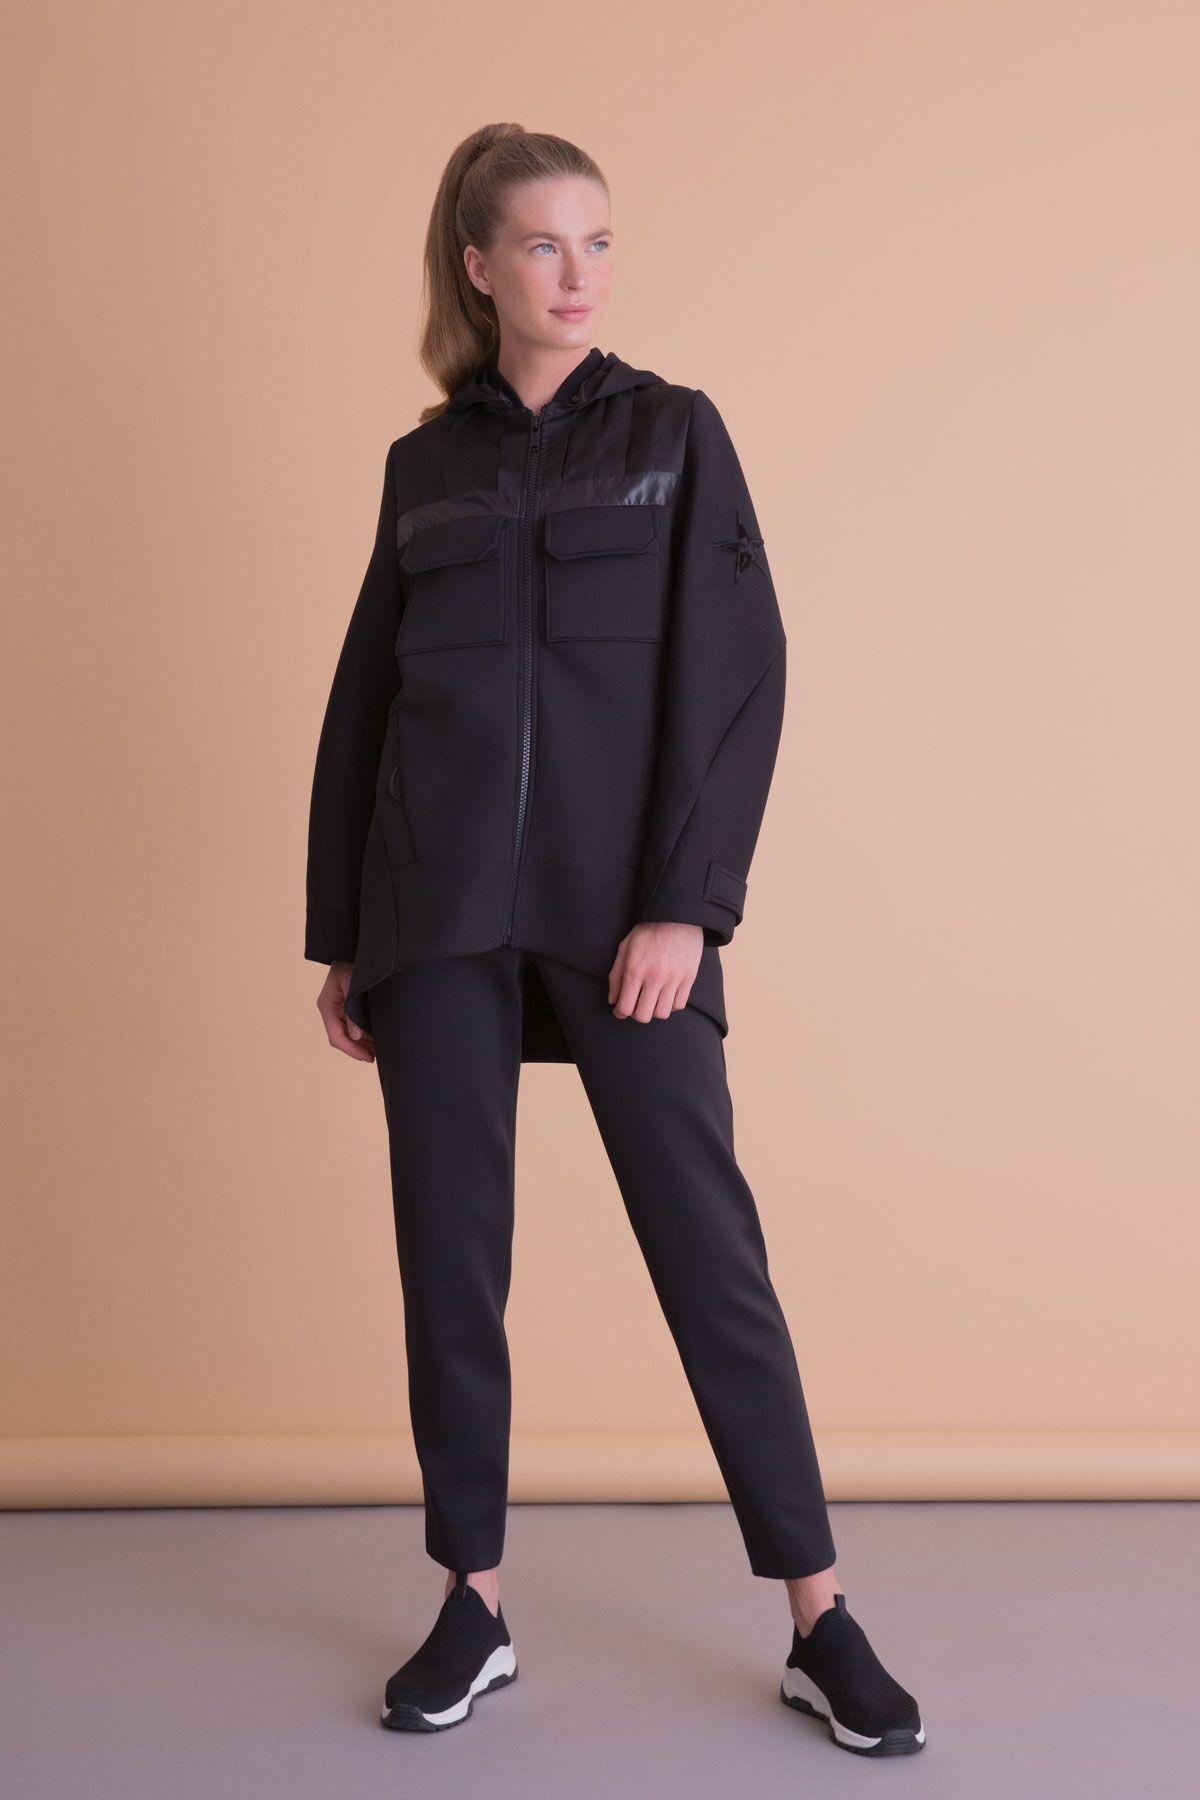 Yıldız Armalı Kapüşonlu Siyah Sweatshirt